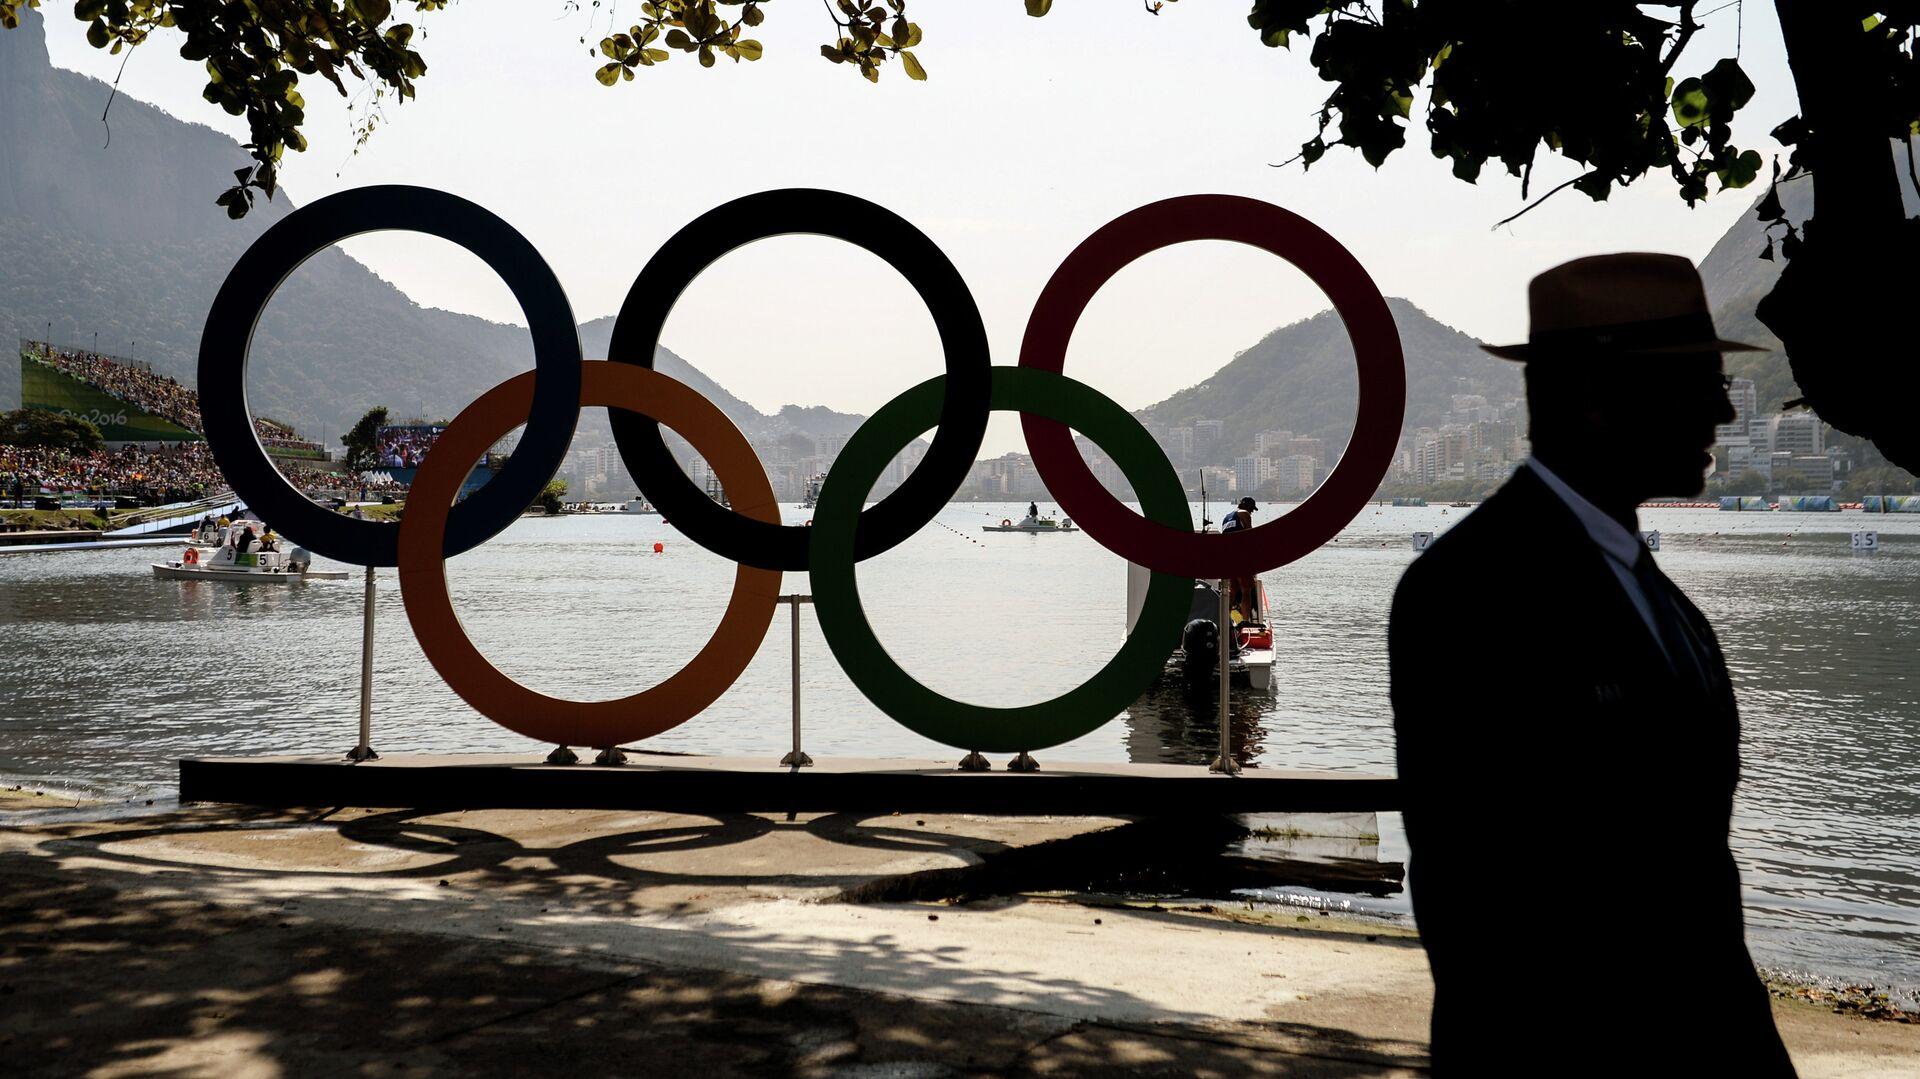 Олимпийские кольца на озере Лагоа в Рио-де-Жанейро - РИА Новости, 1920, 02.08.2021